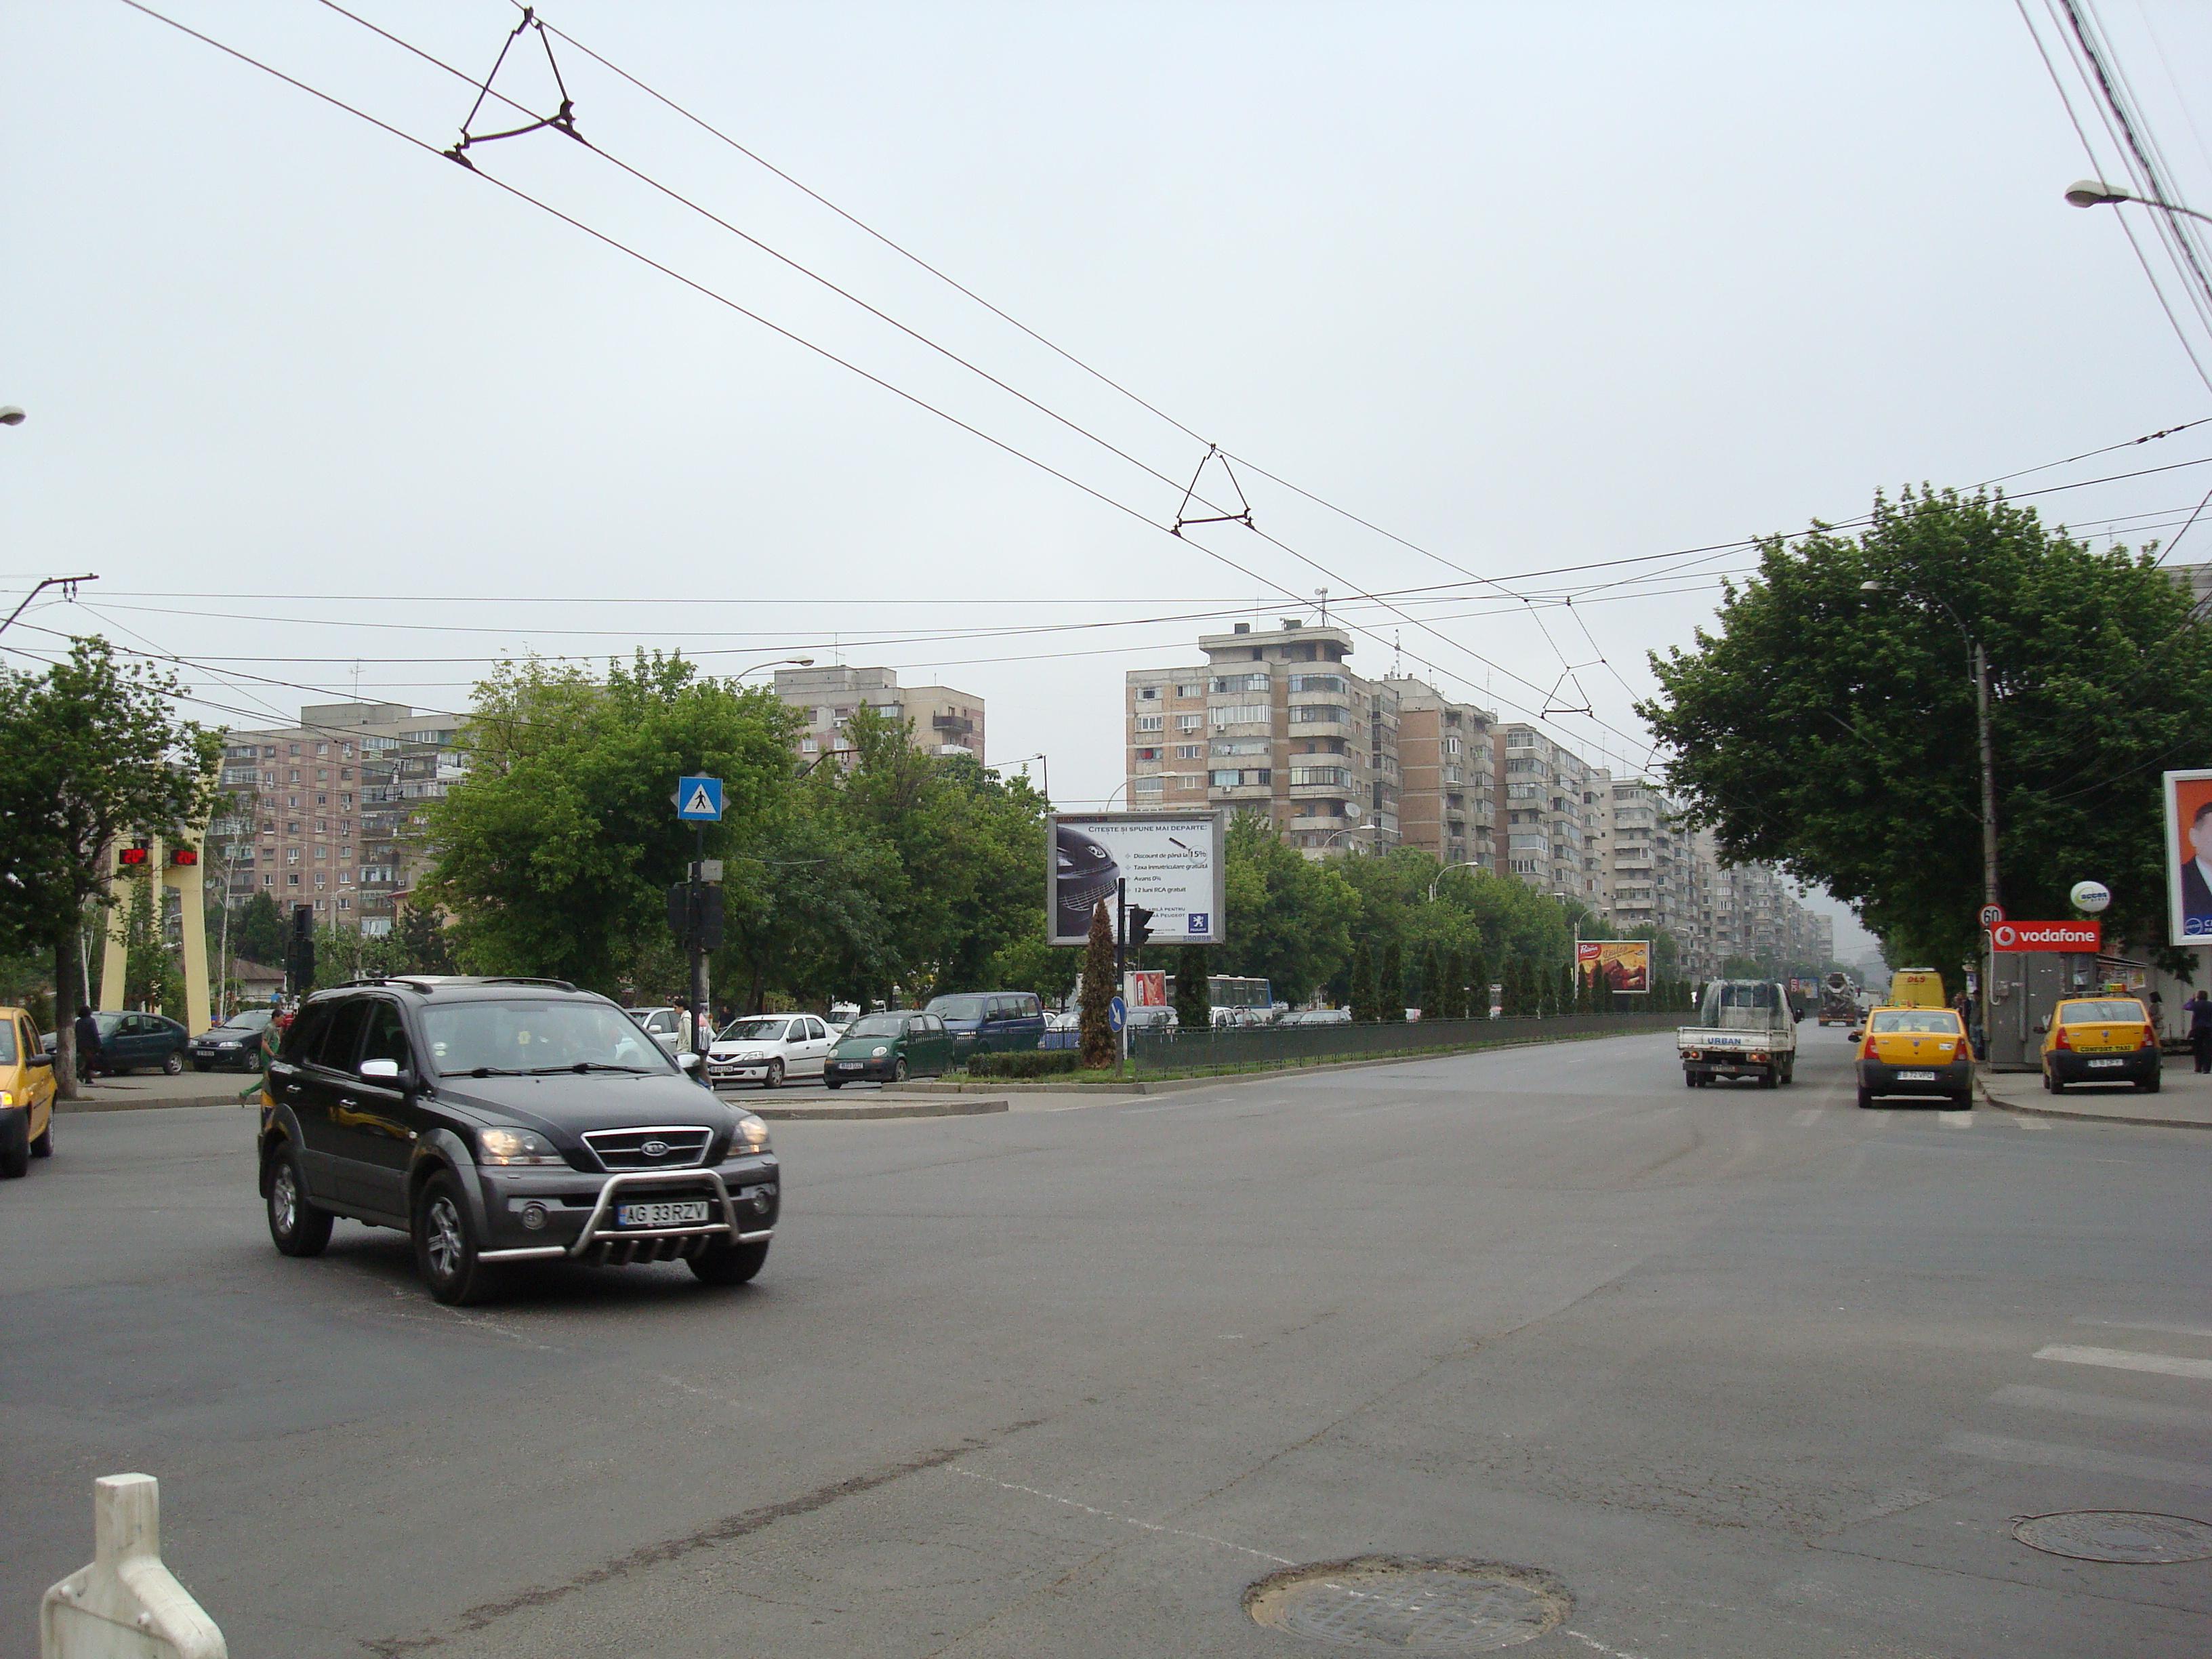 Sector 6 Bucharest Wikipedia